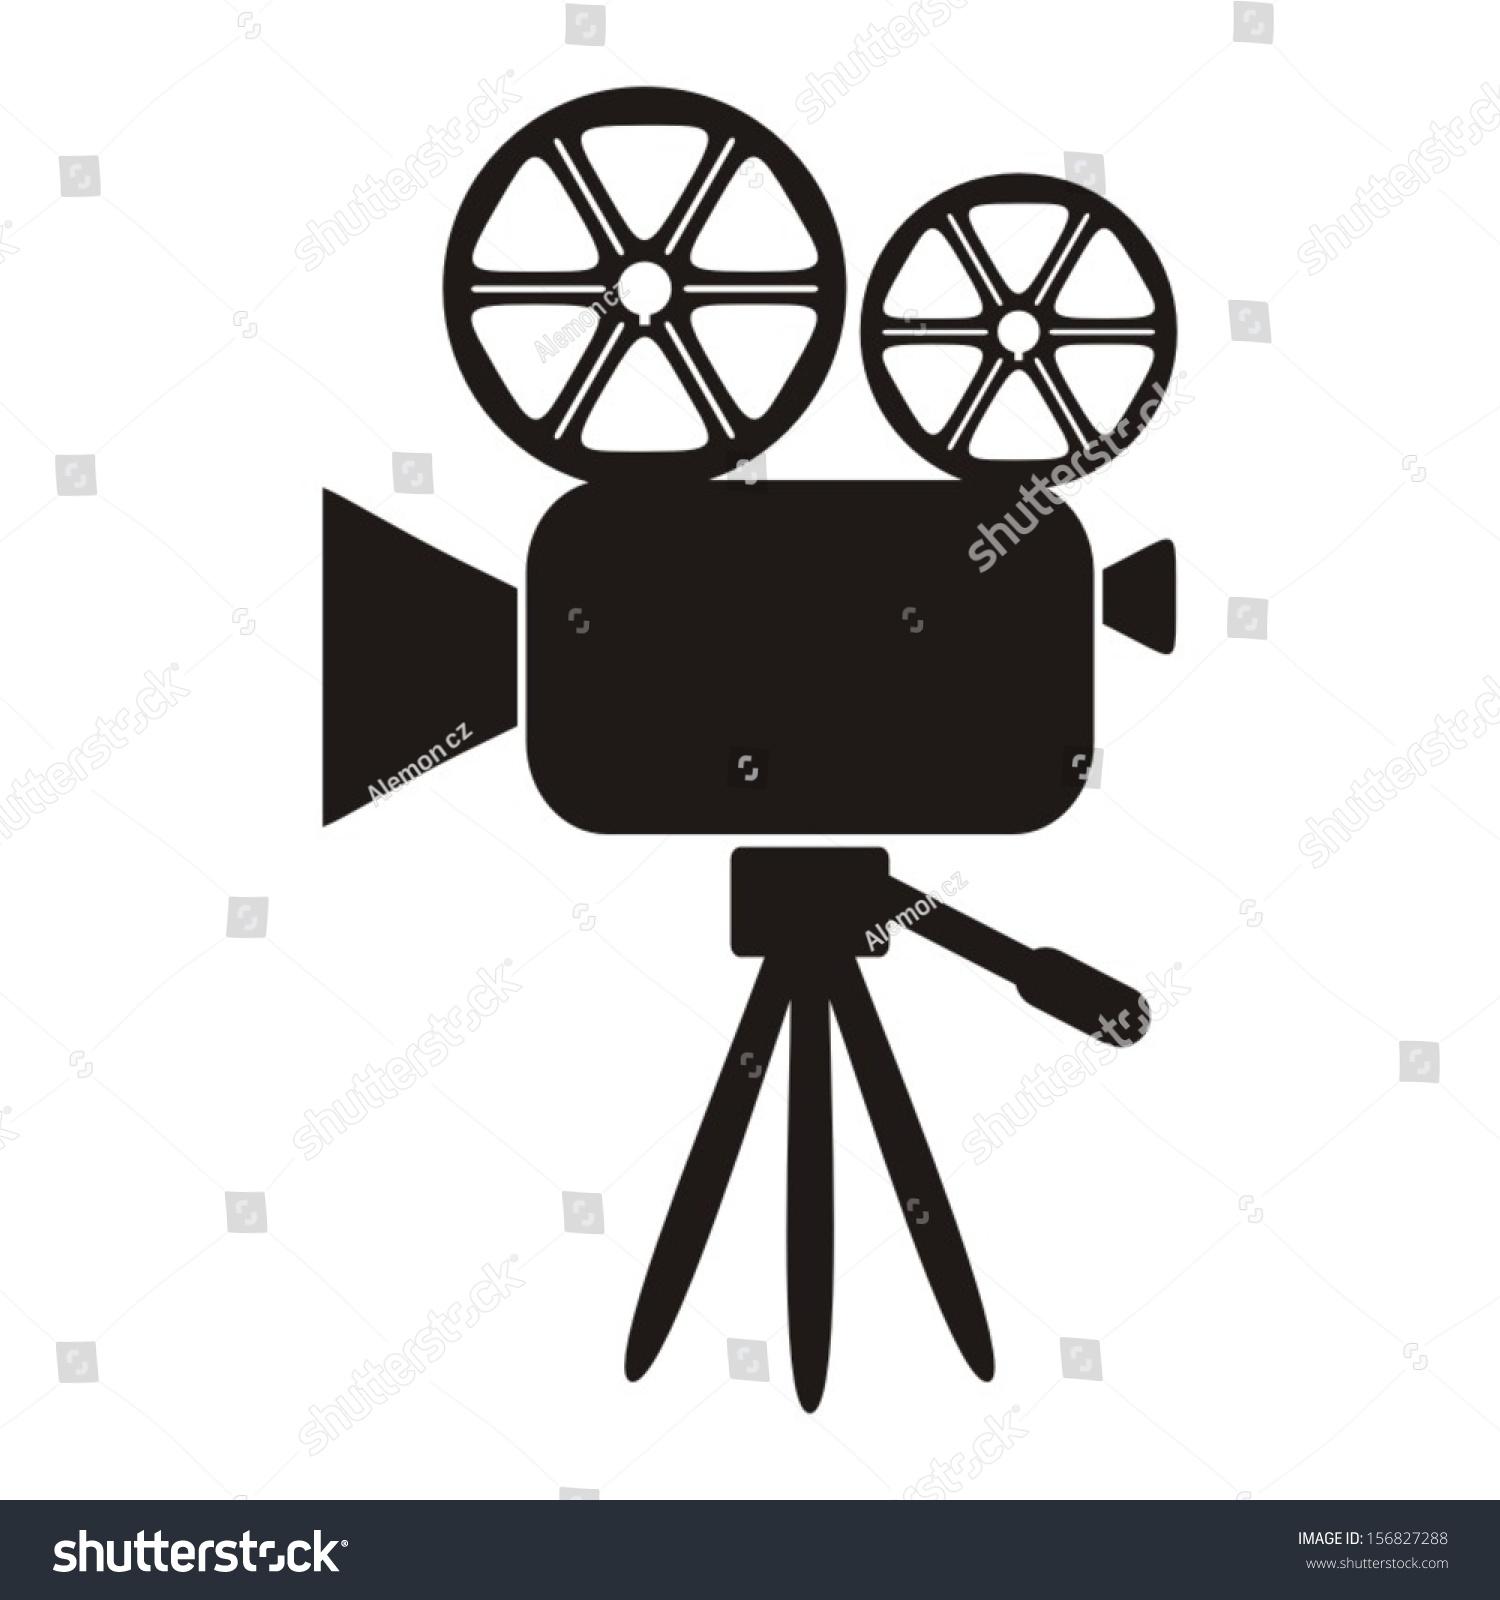 Projector Clipart movie projector stock vectors & vector clip art ...